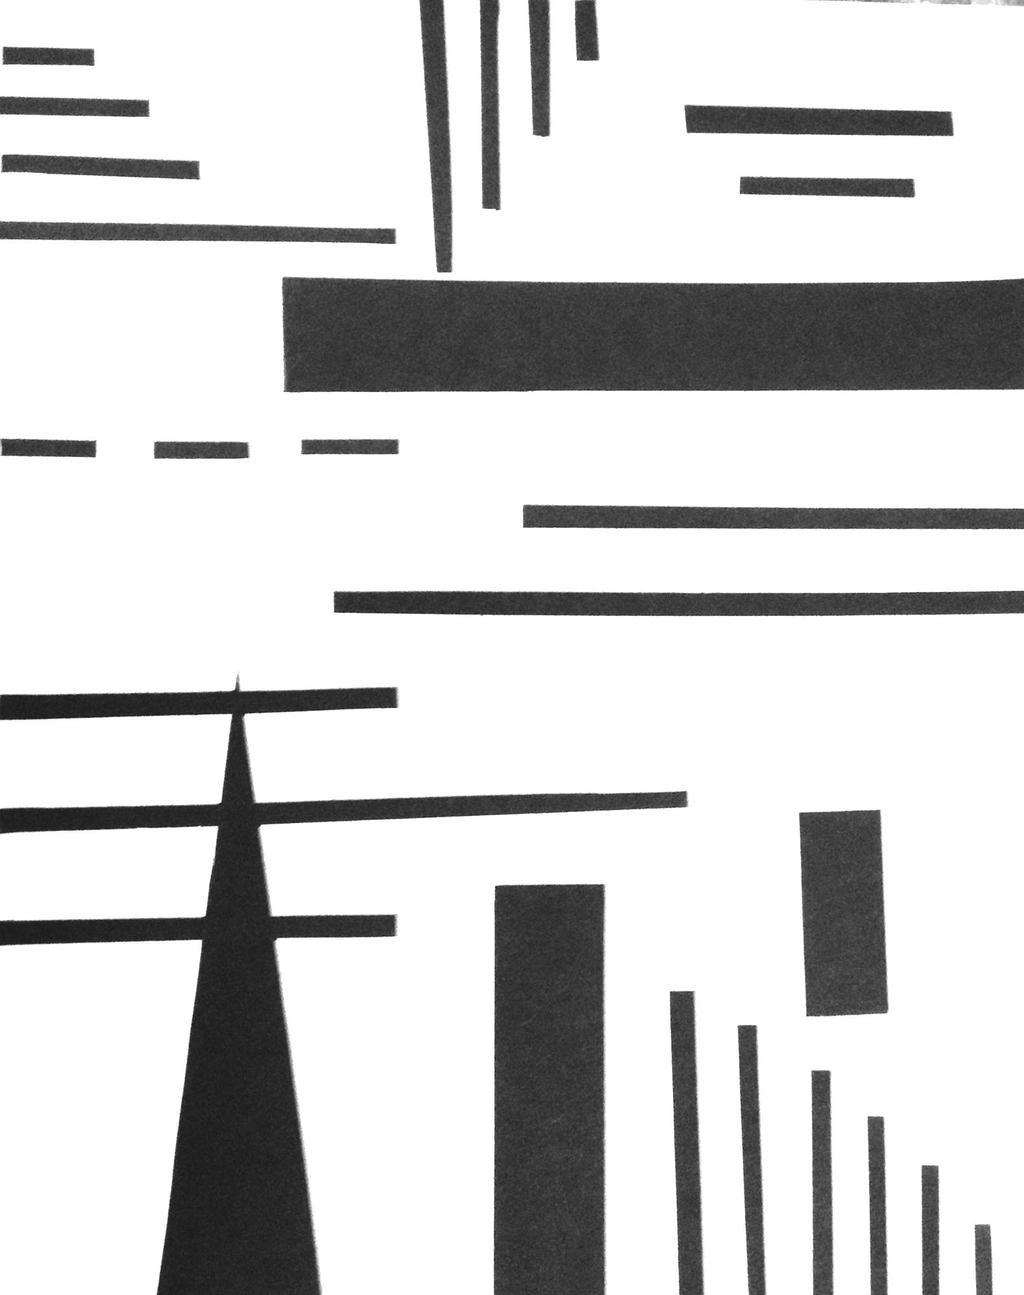 Horizontal Line Art : Vertical horizontal line composition by artbyjulia on